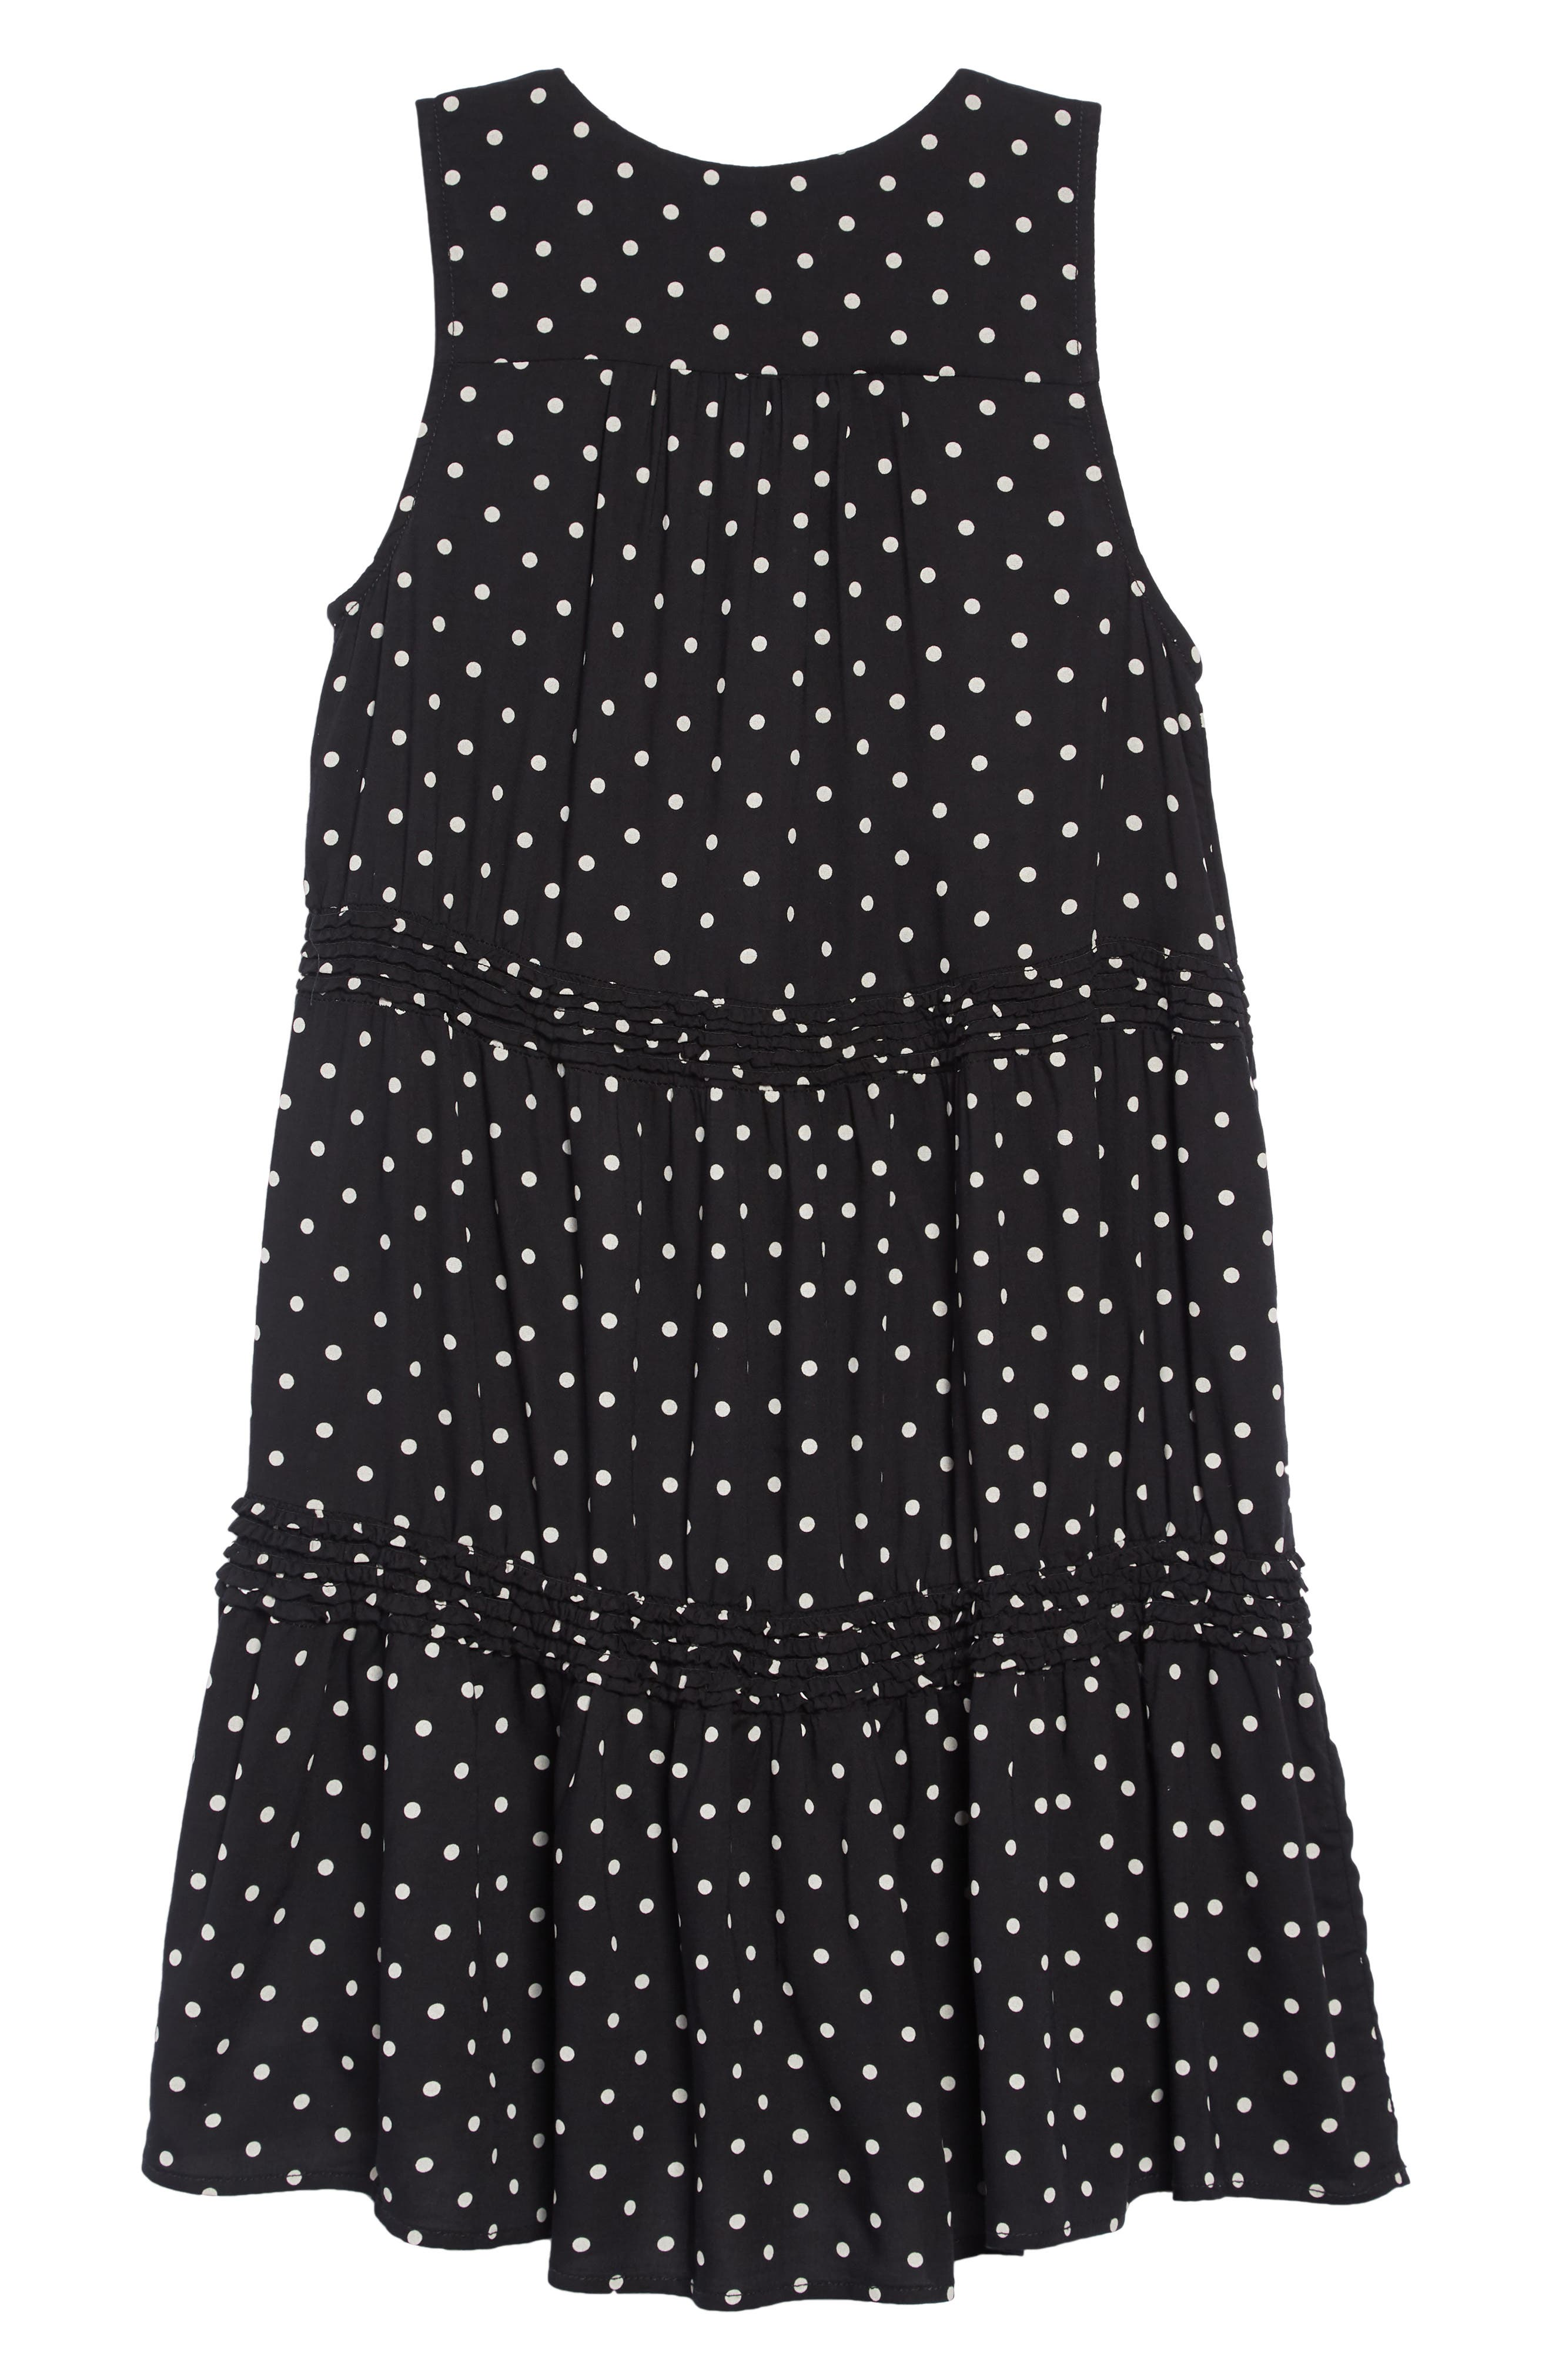 Tiered Print Dress,                             Alternate thumbnail 2, color,                             BLACK- WHITE DOT